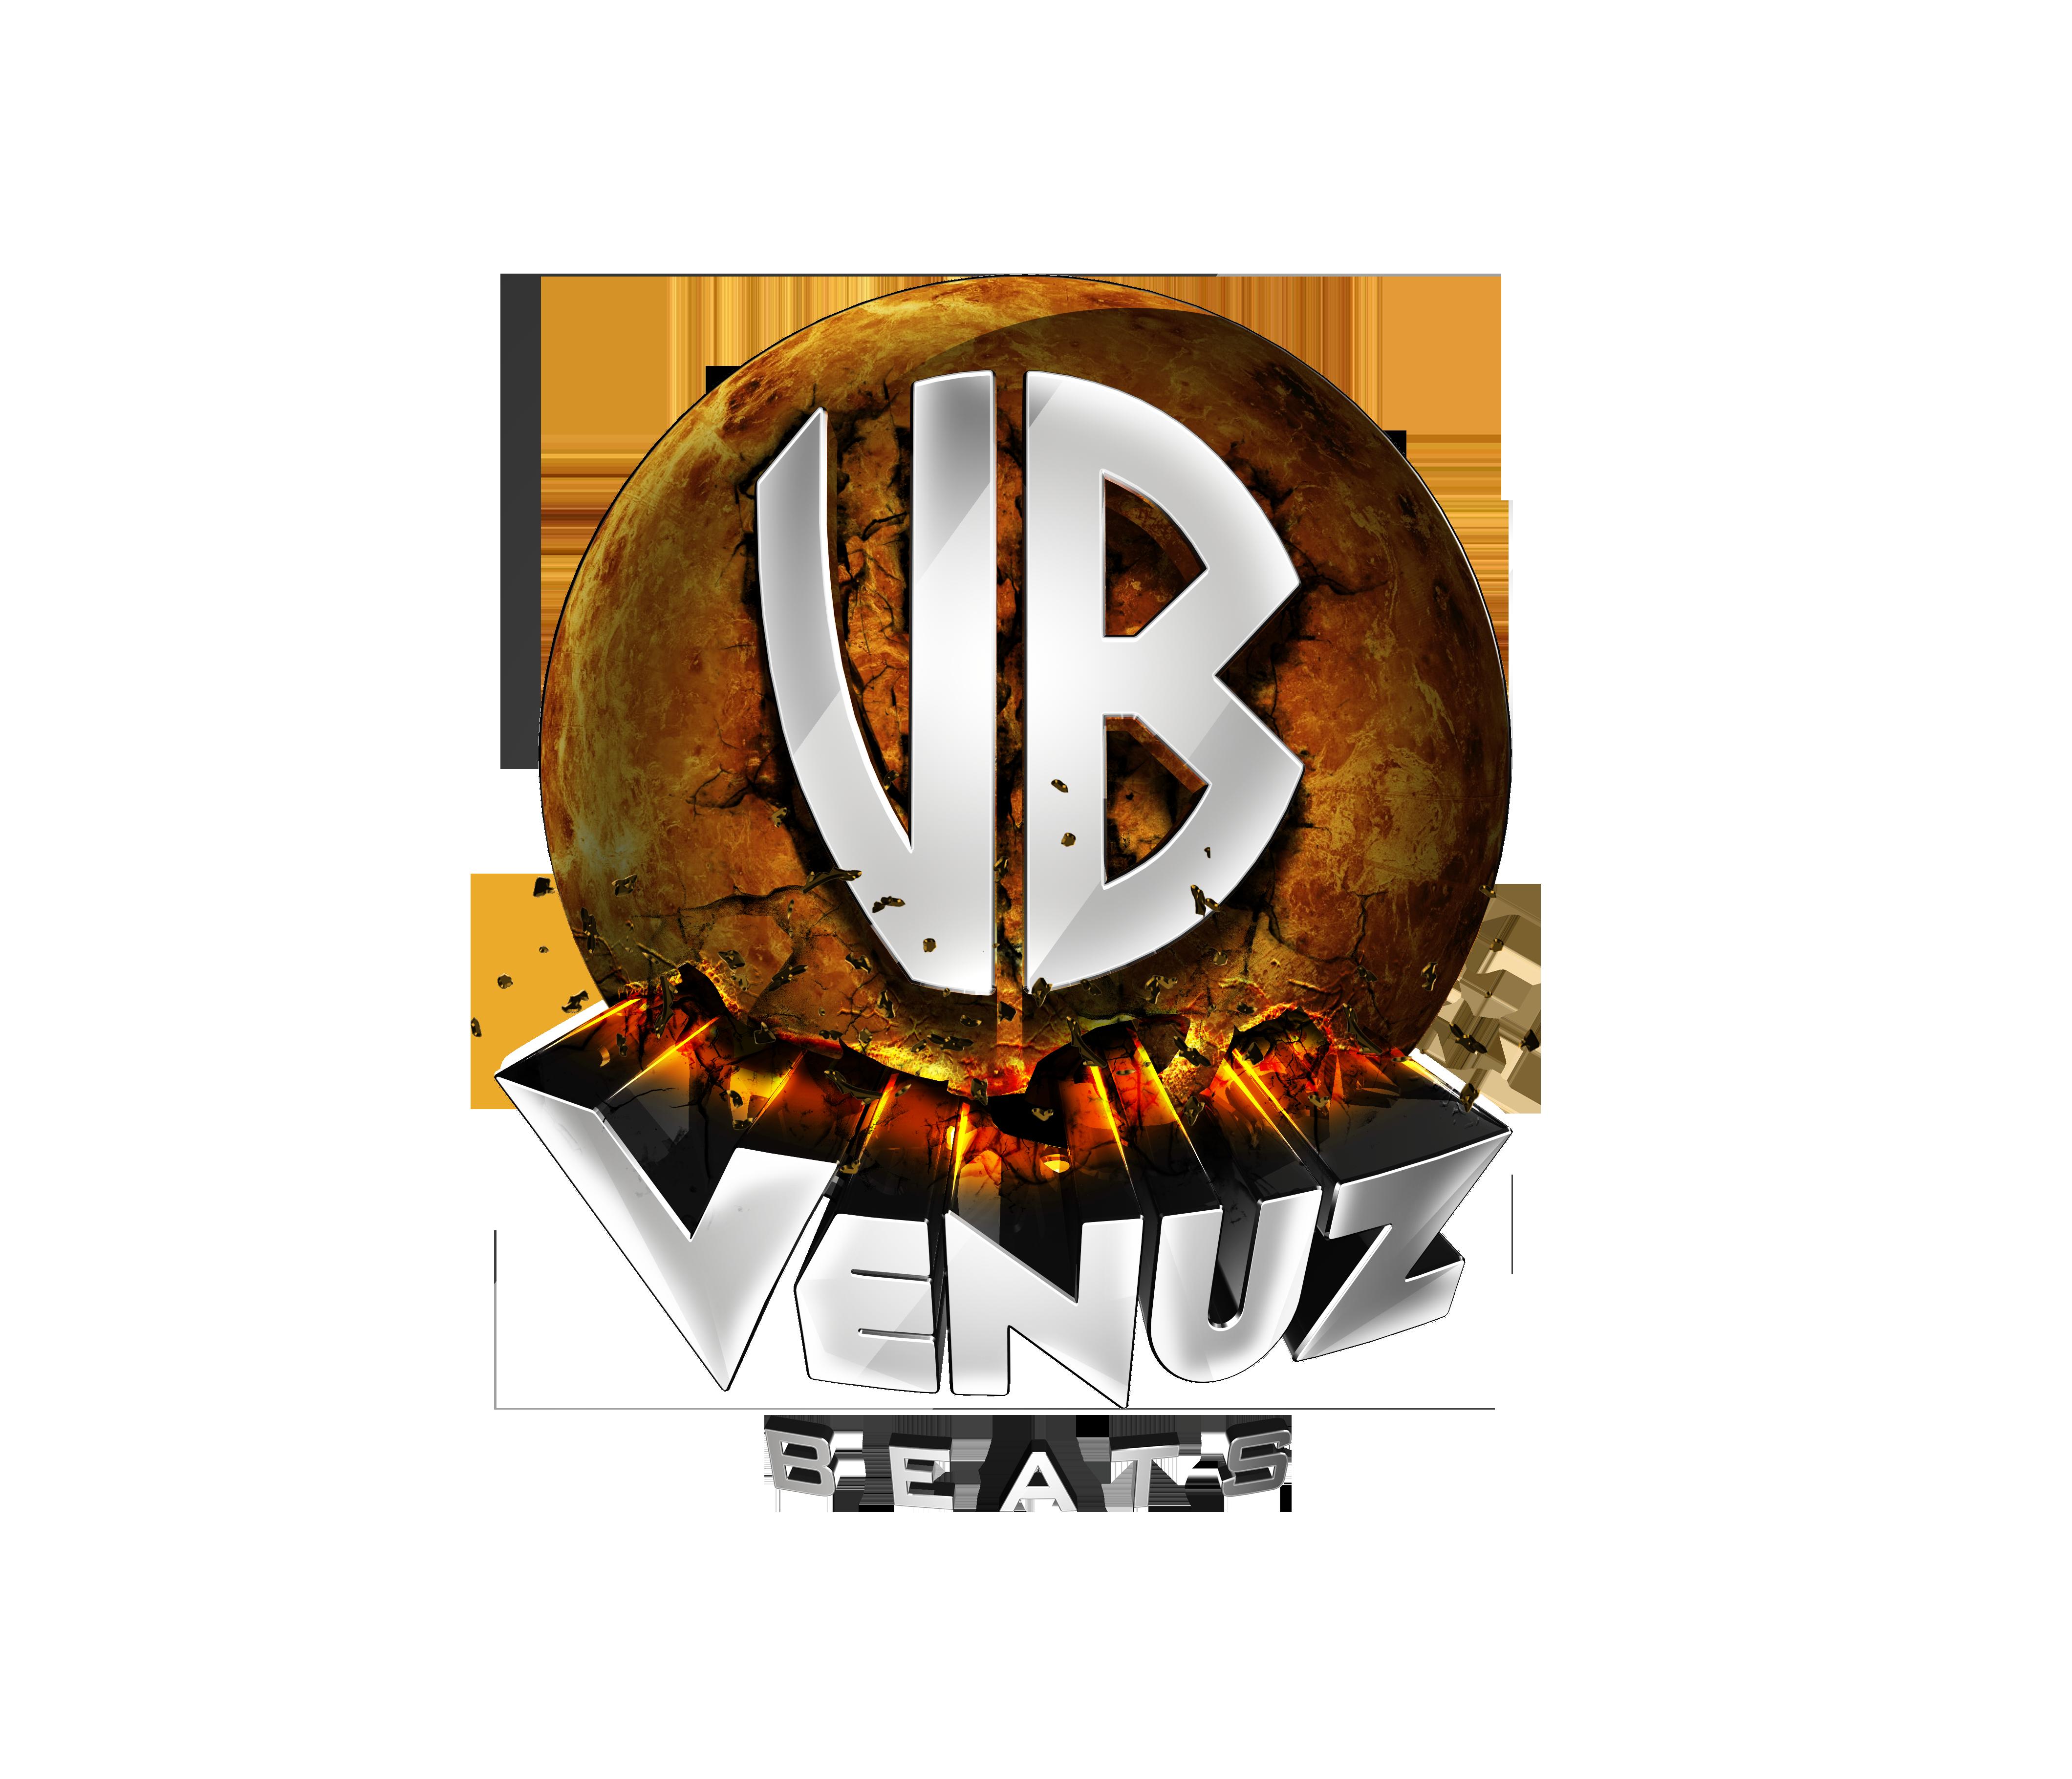 Soulful Instrumentals - Venuz Beats